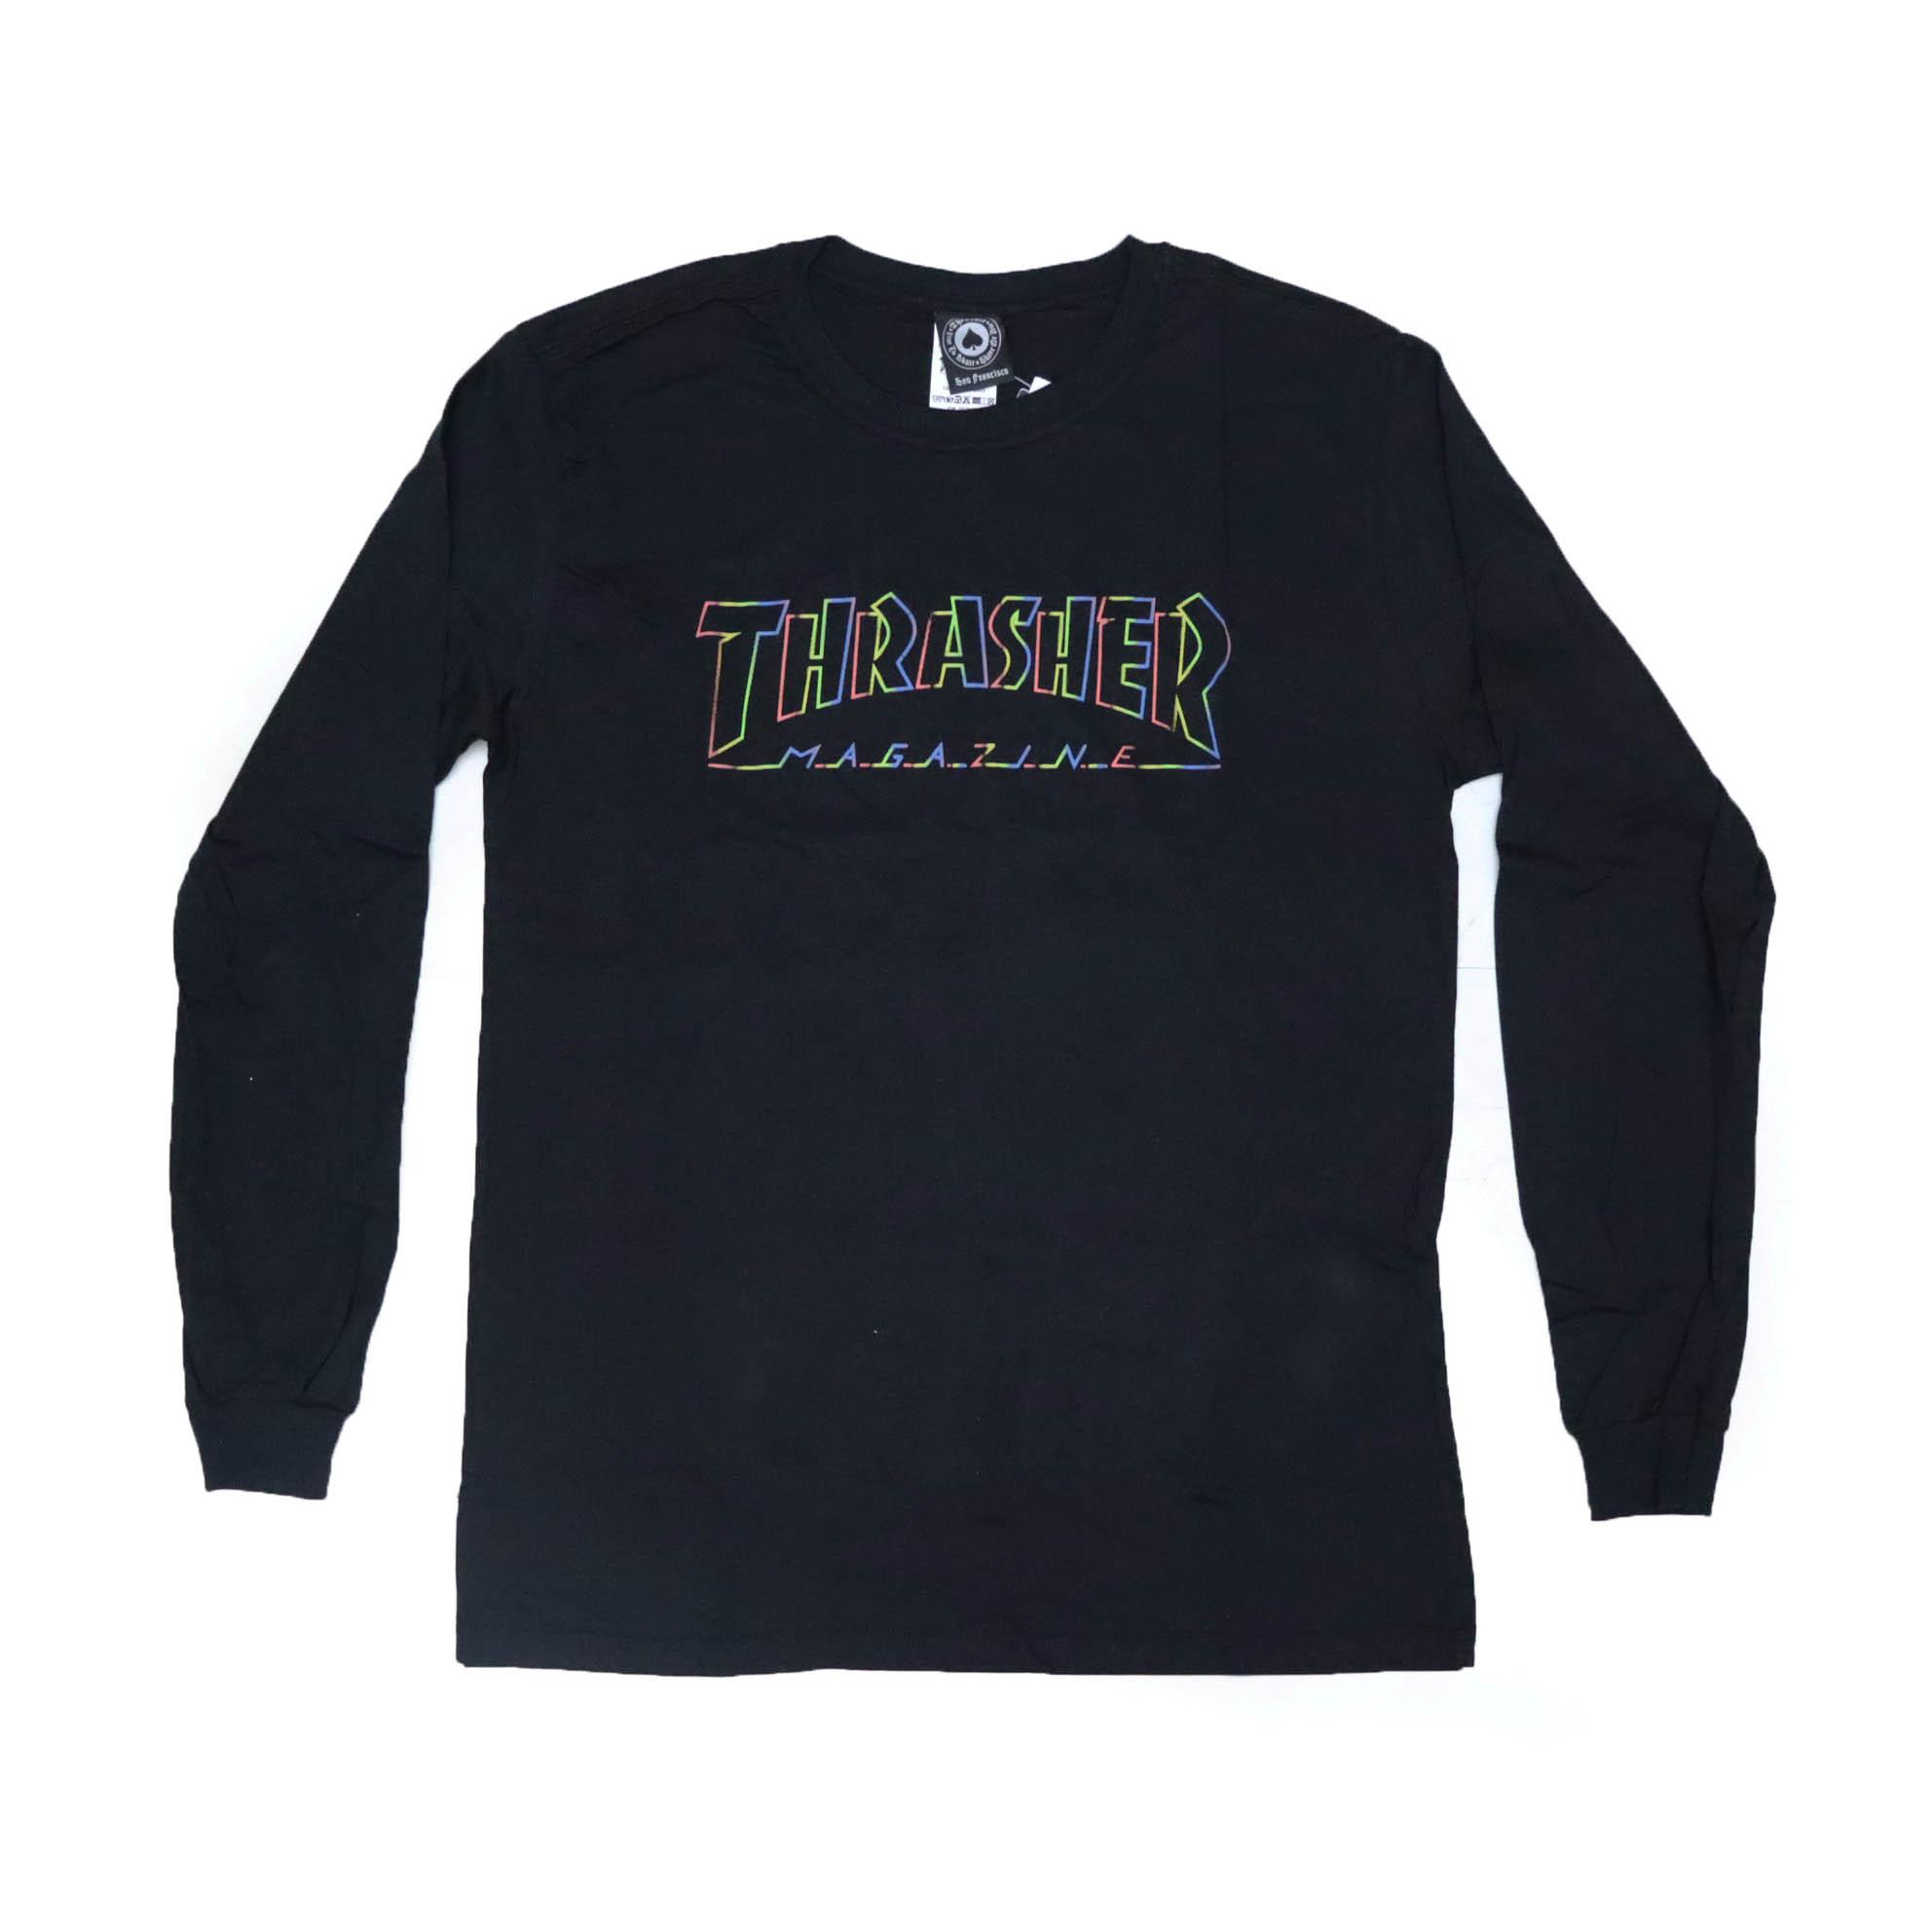 Camiseta Thrasher Manga Longa Spectrum - Preto